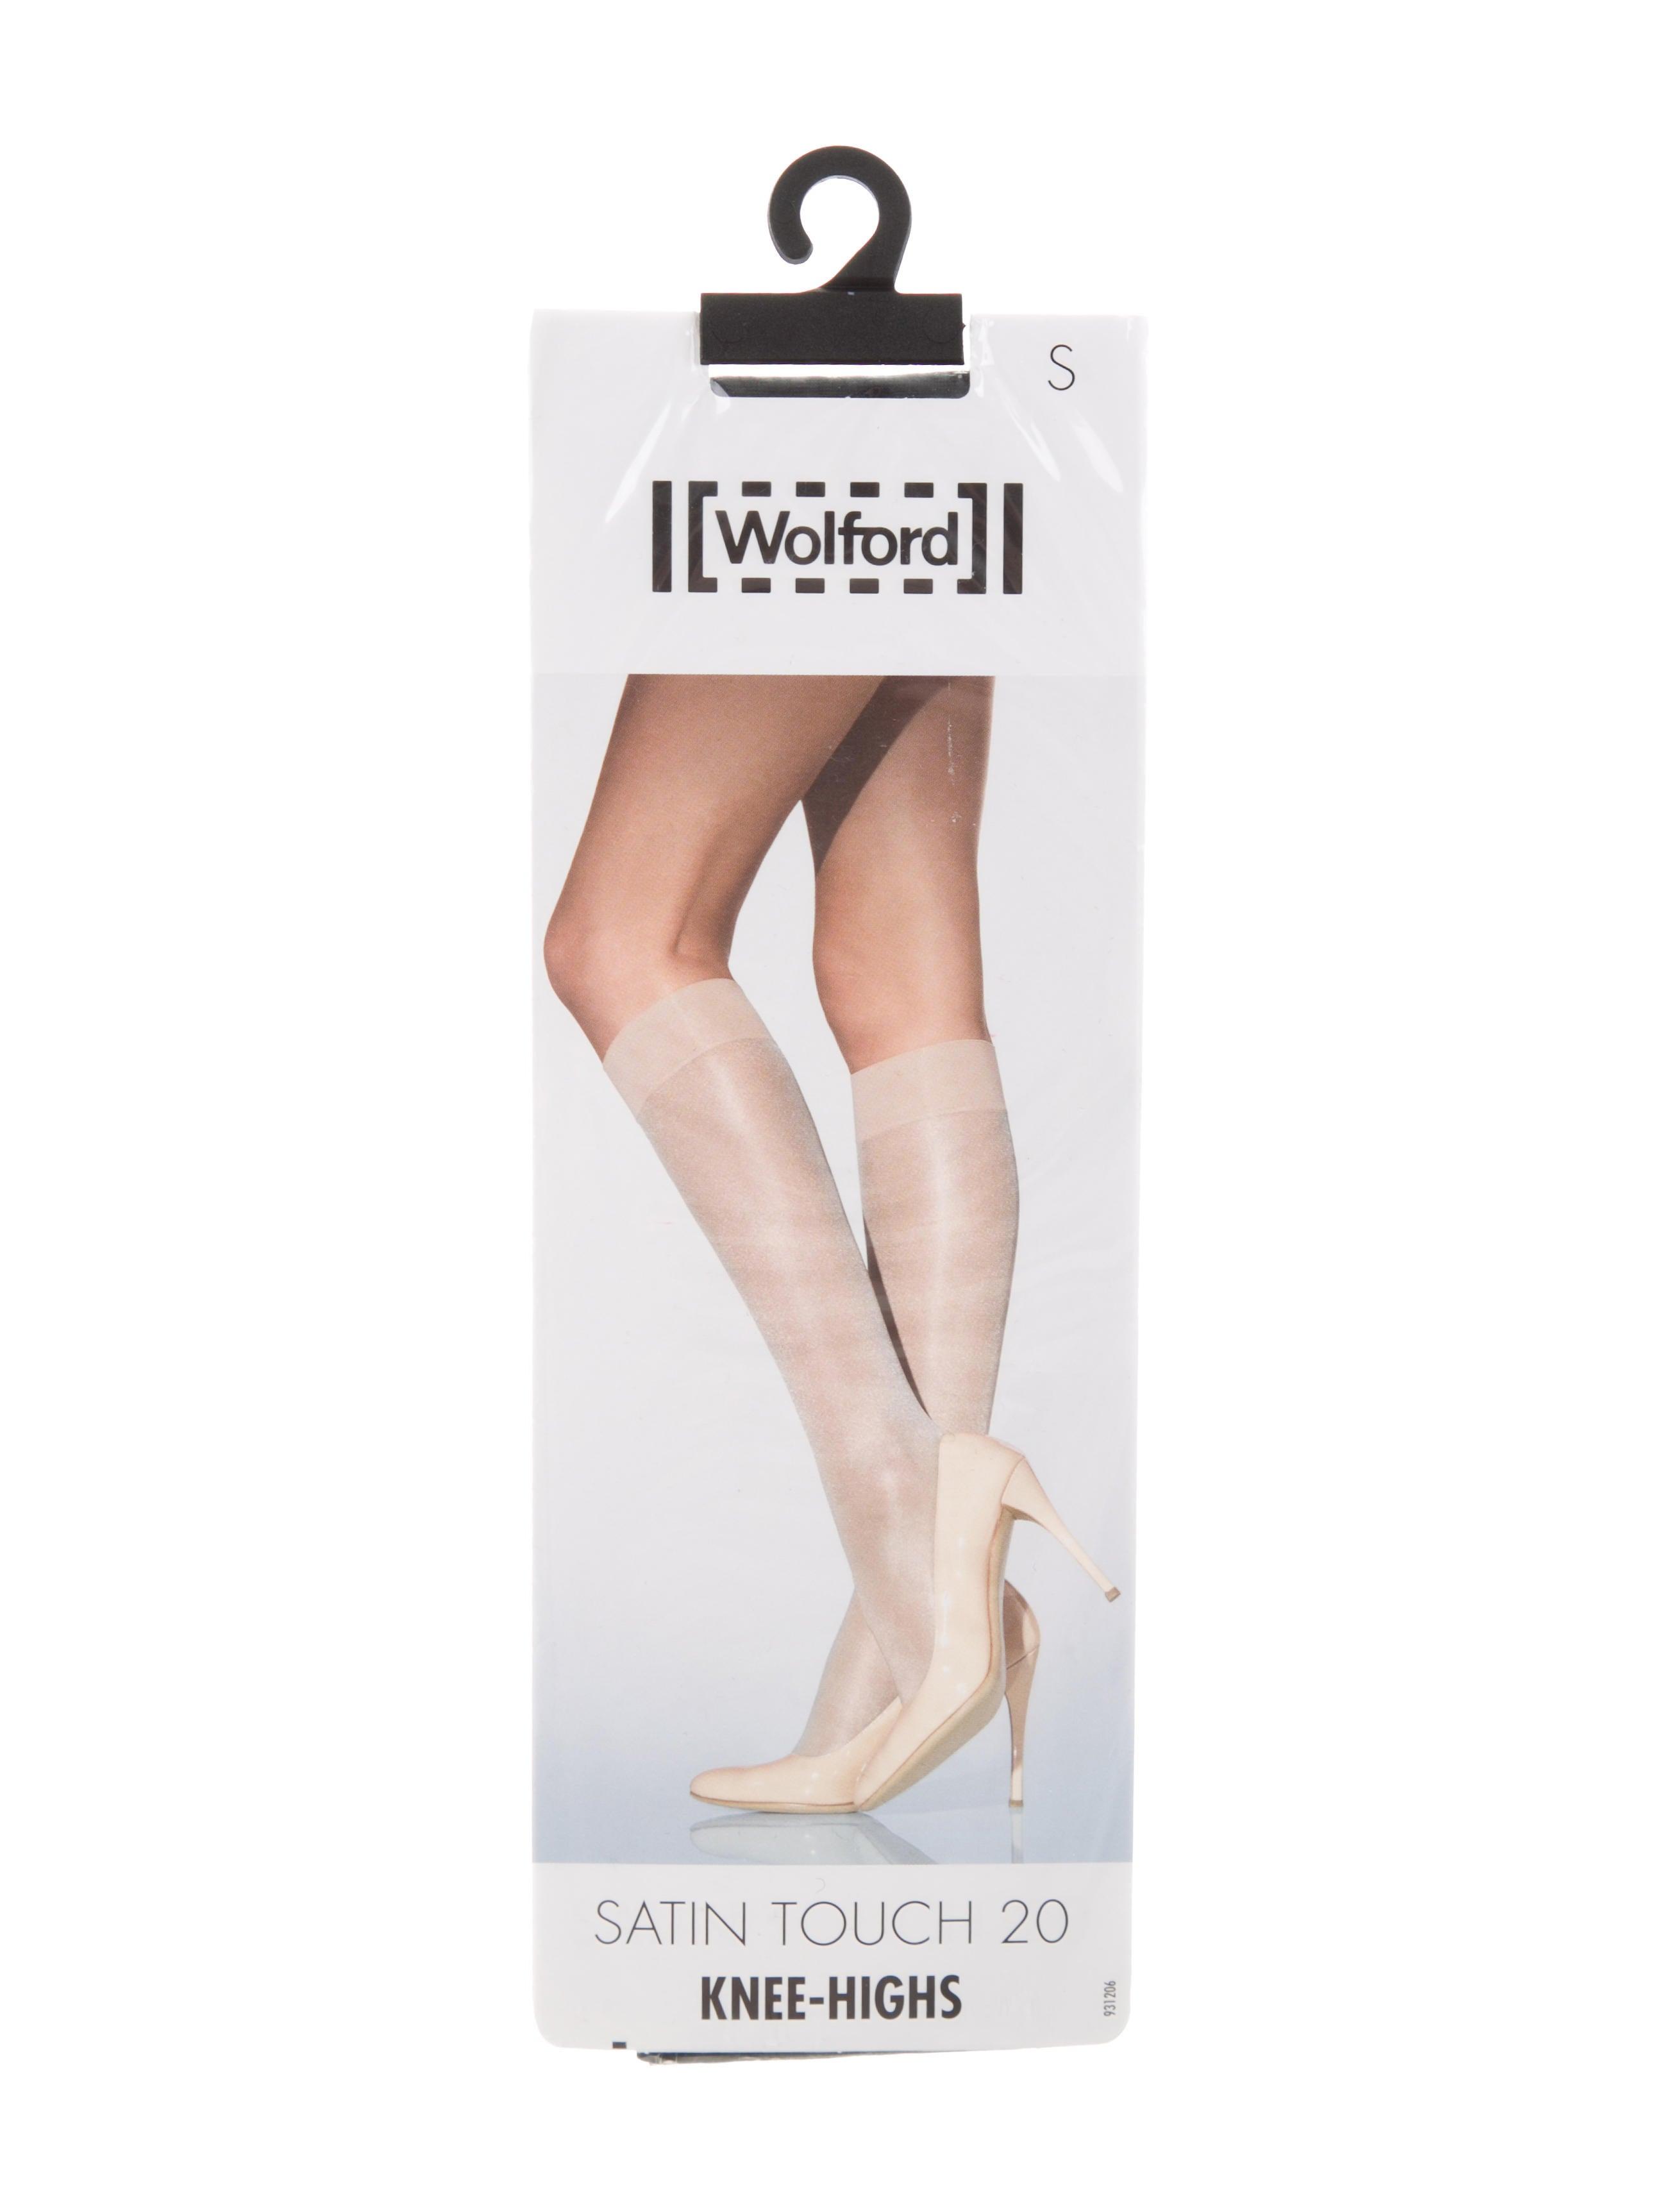 efbaf892b31 Wolford Satin Touch 20 Knee-High Socks w  Tags - Accessories ...